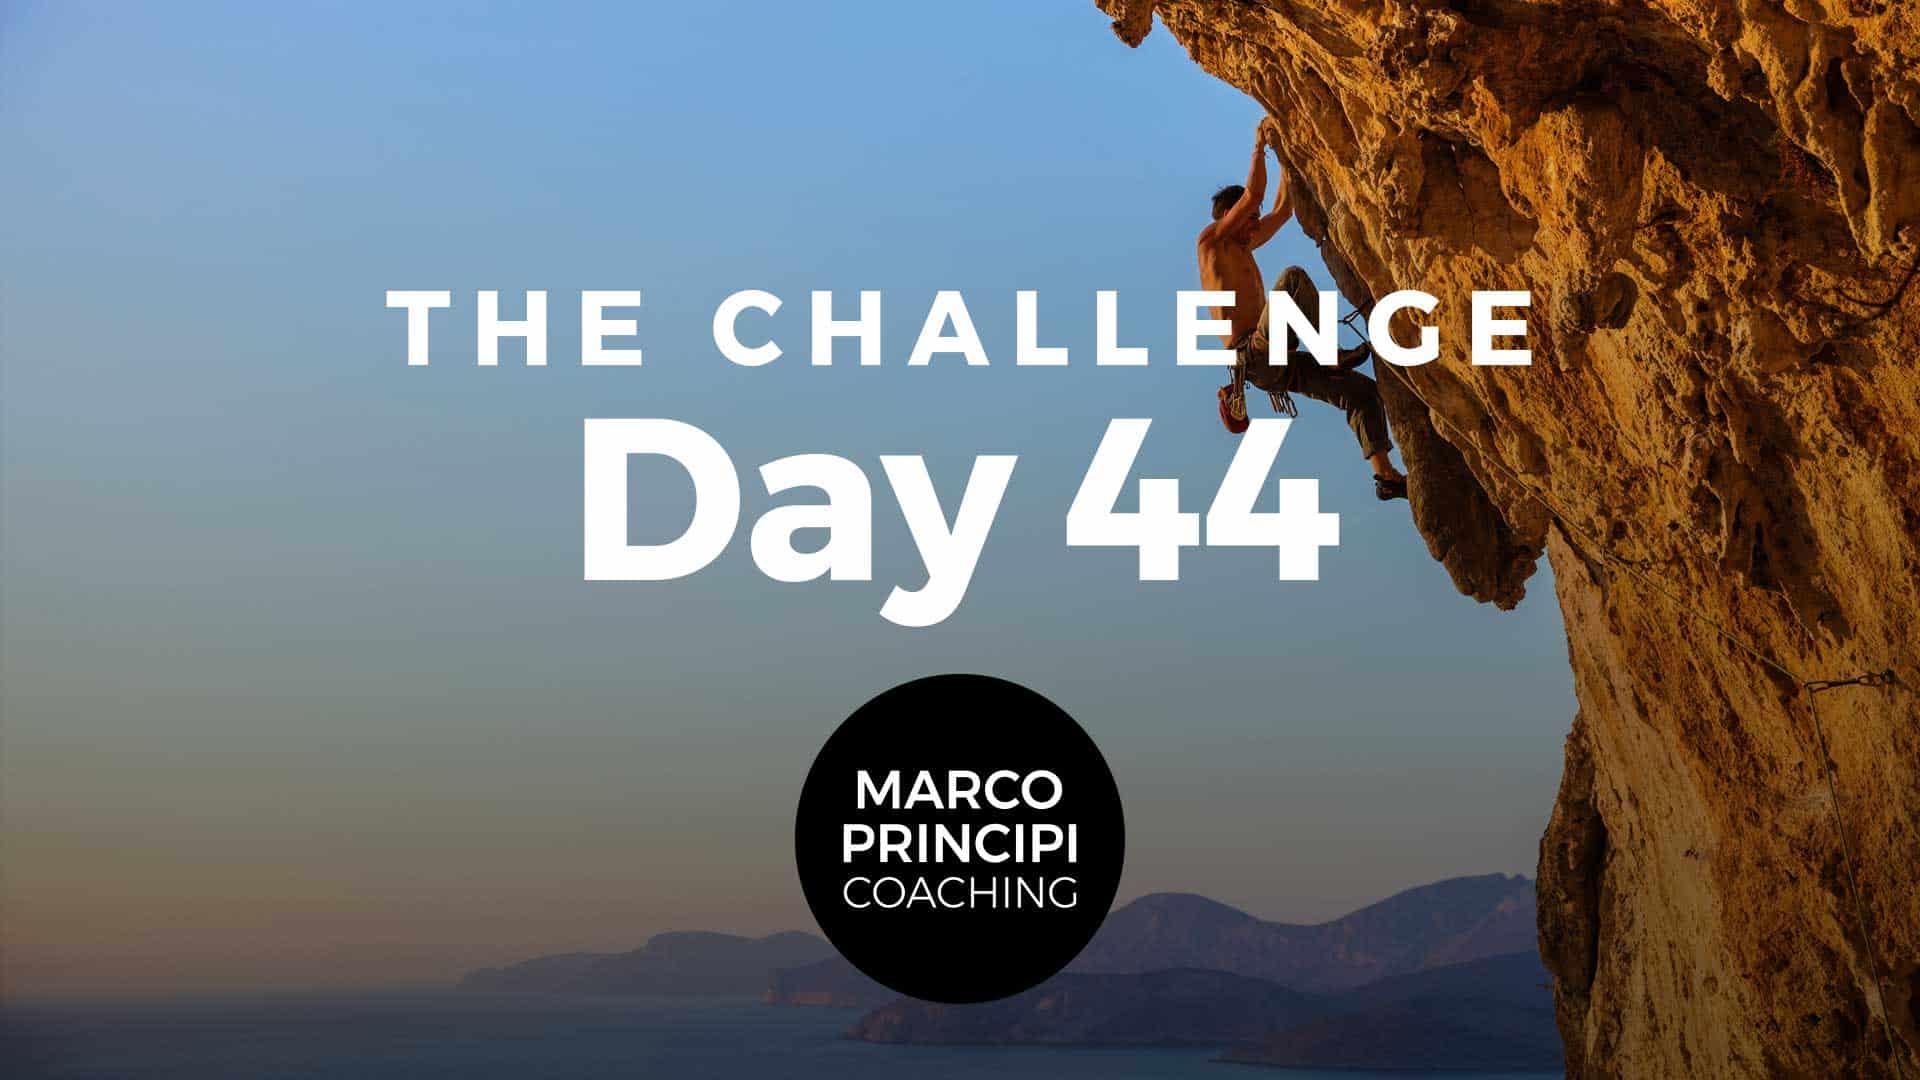 Marco Principi The Challenge Day 44